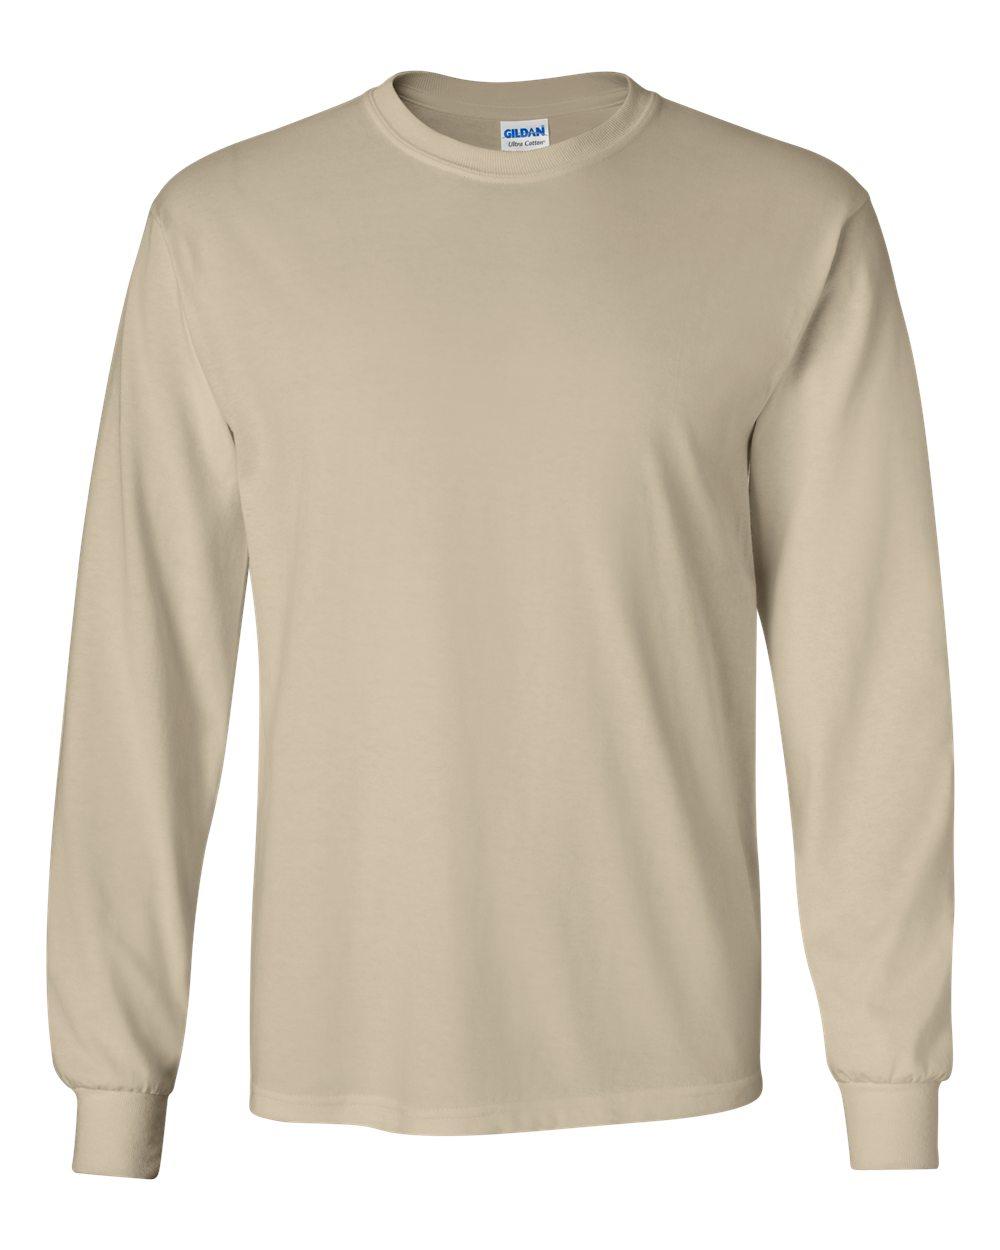 63608461f32f GILDAN Ultra Cotton Long Sleeve T   Custom T Shirts   Entripy